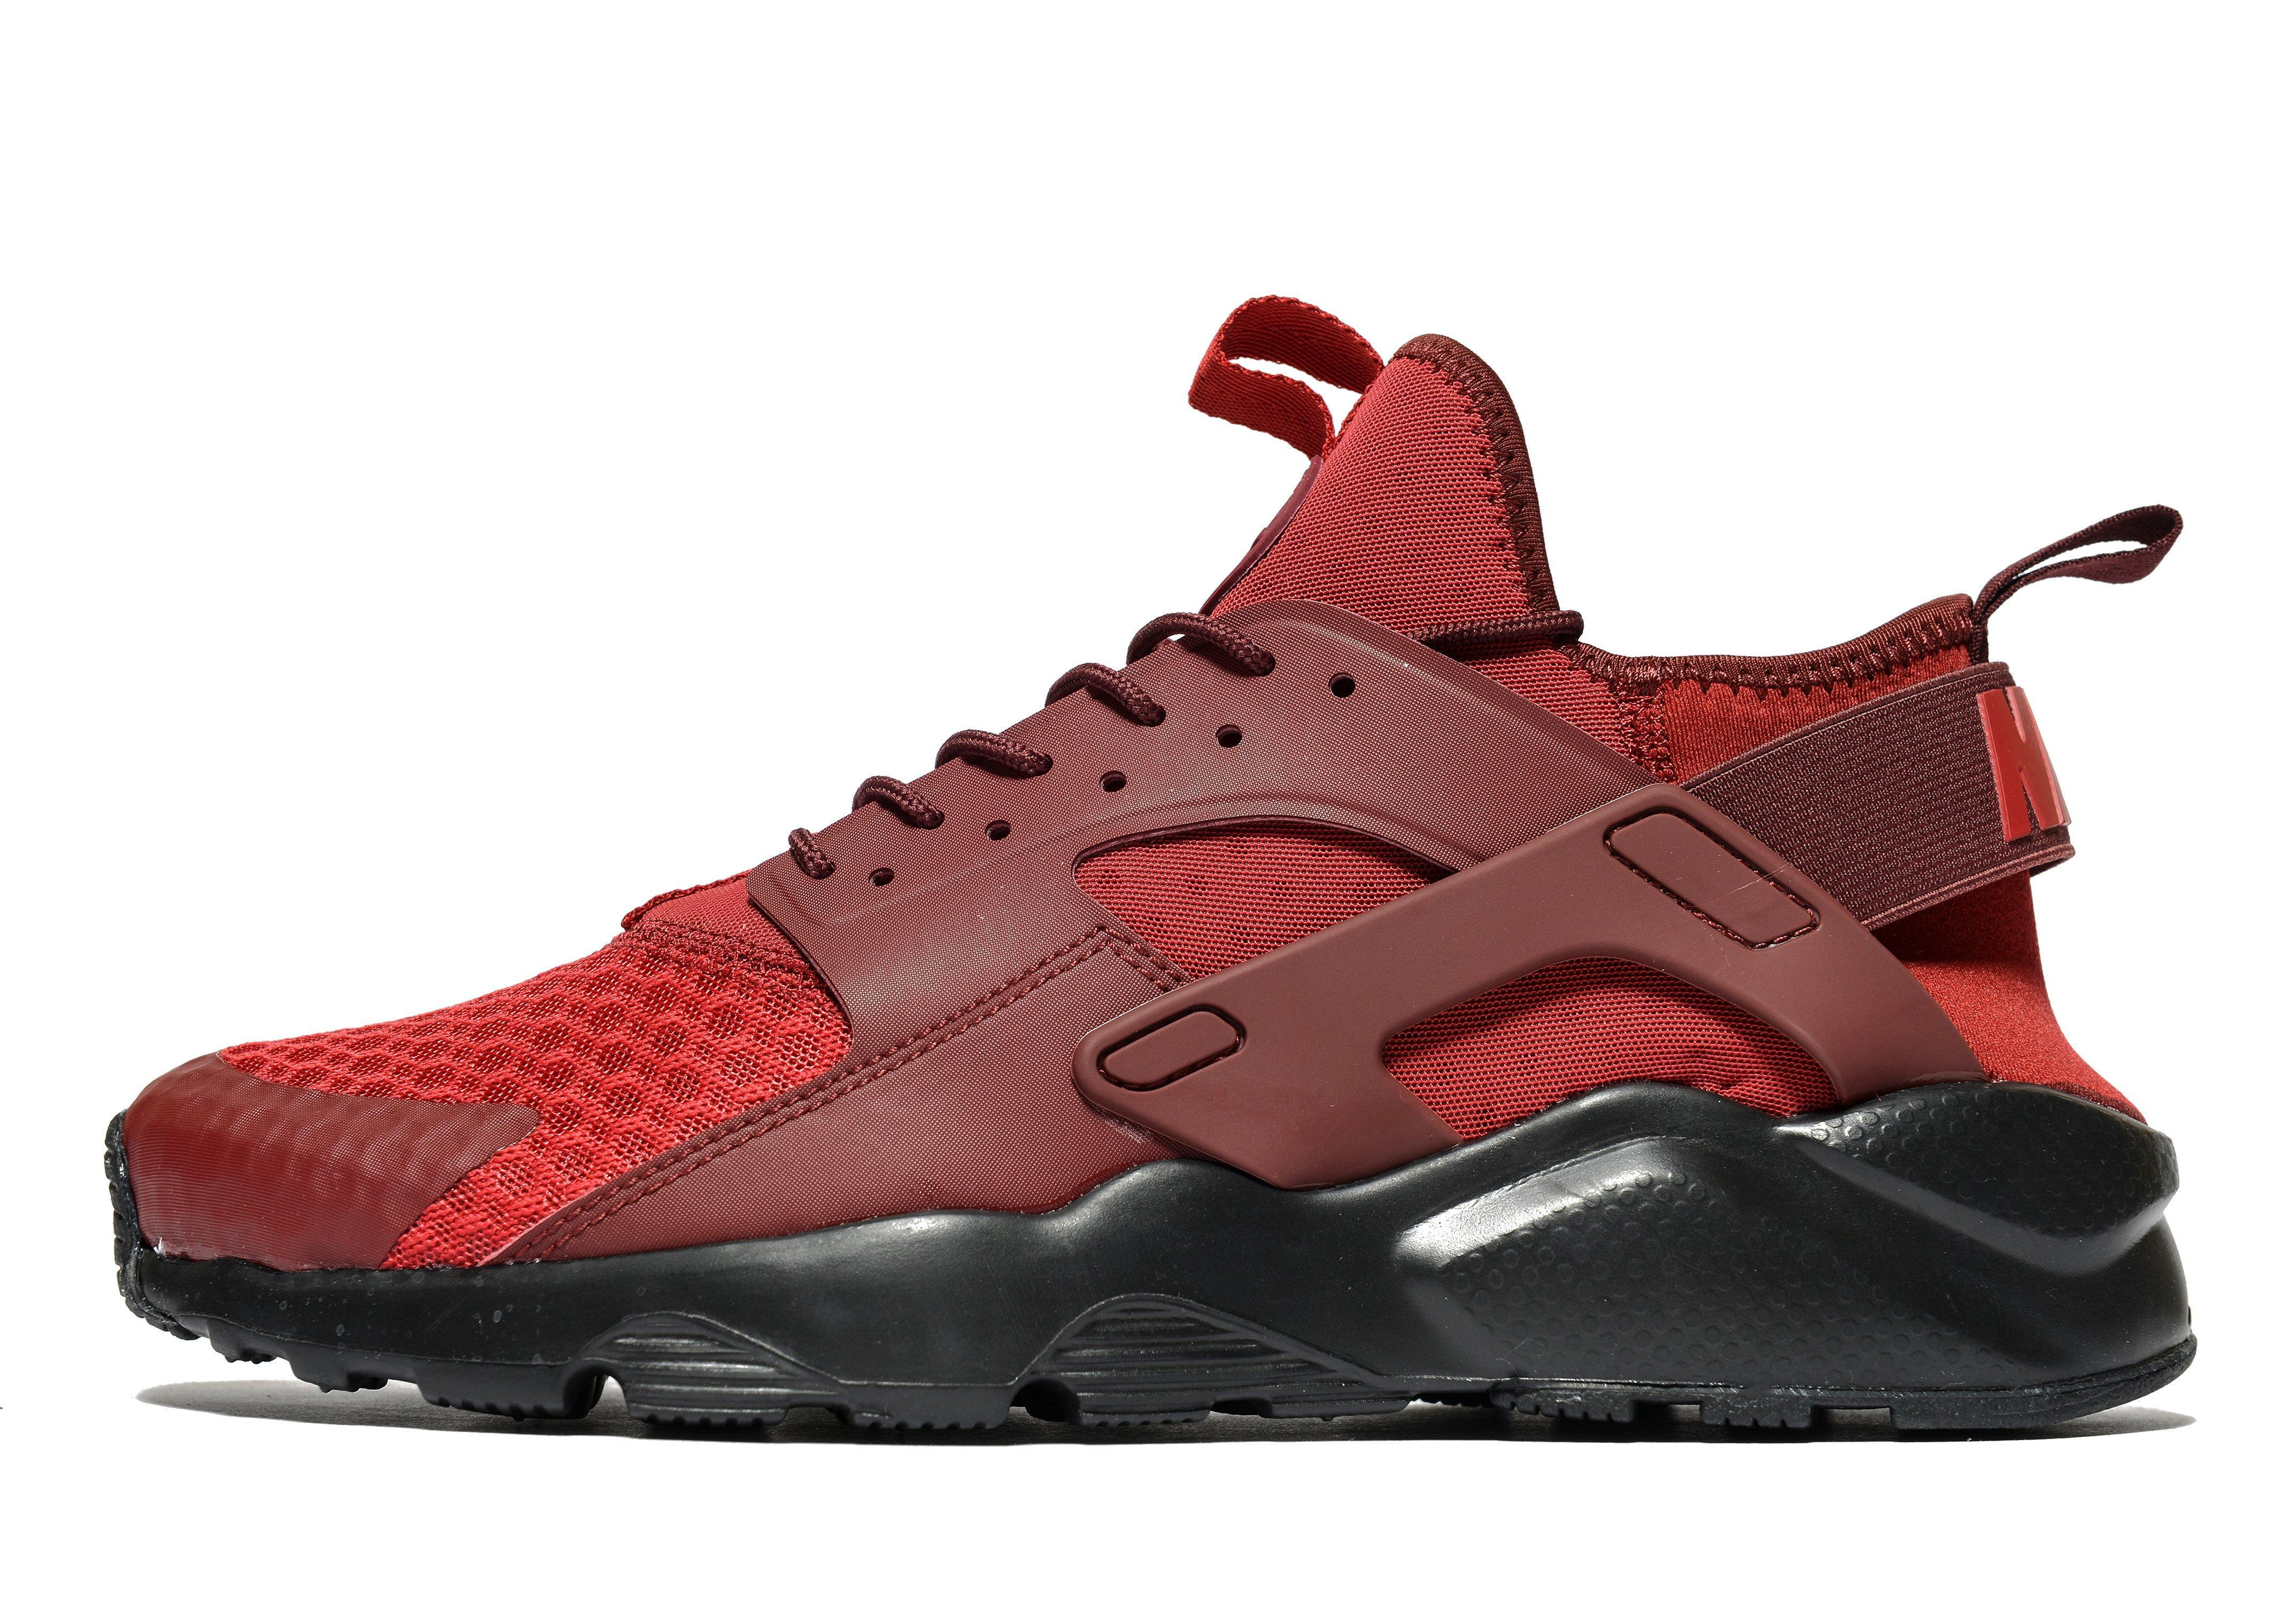 f2a8f4ede918 Lyst - Nike Huarache Ultra in Red for Men